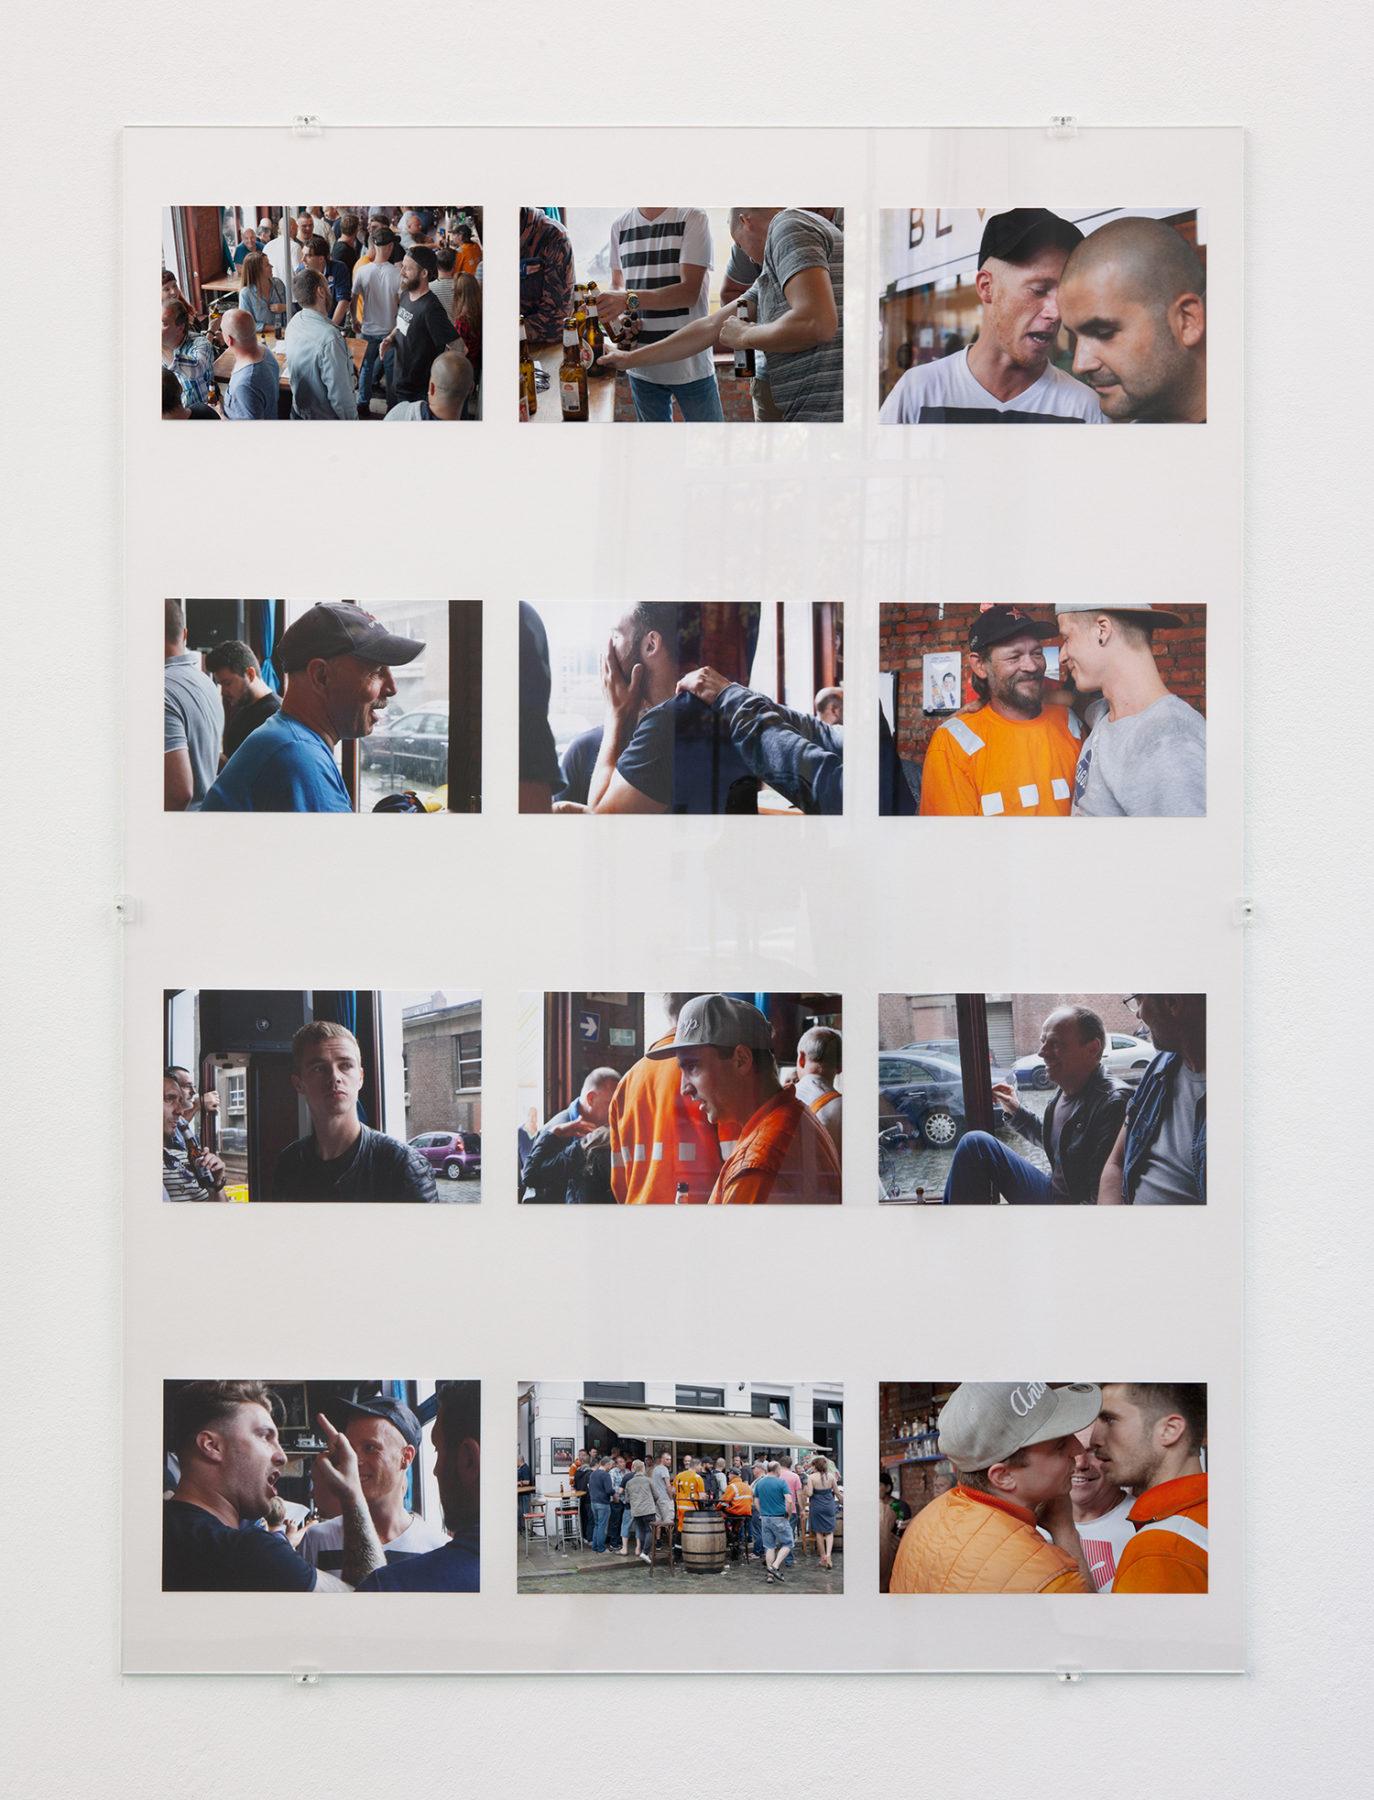 Aanwervingslokaal - Afscheidsparty, pigment prints, glass, 2018